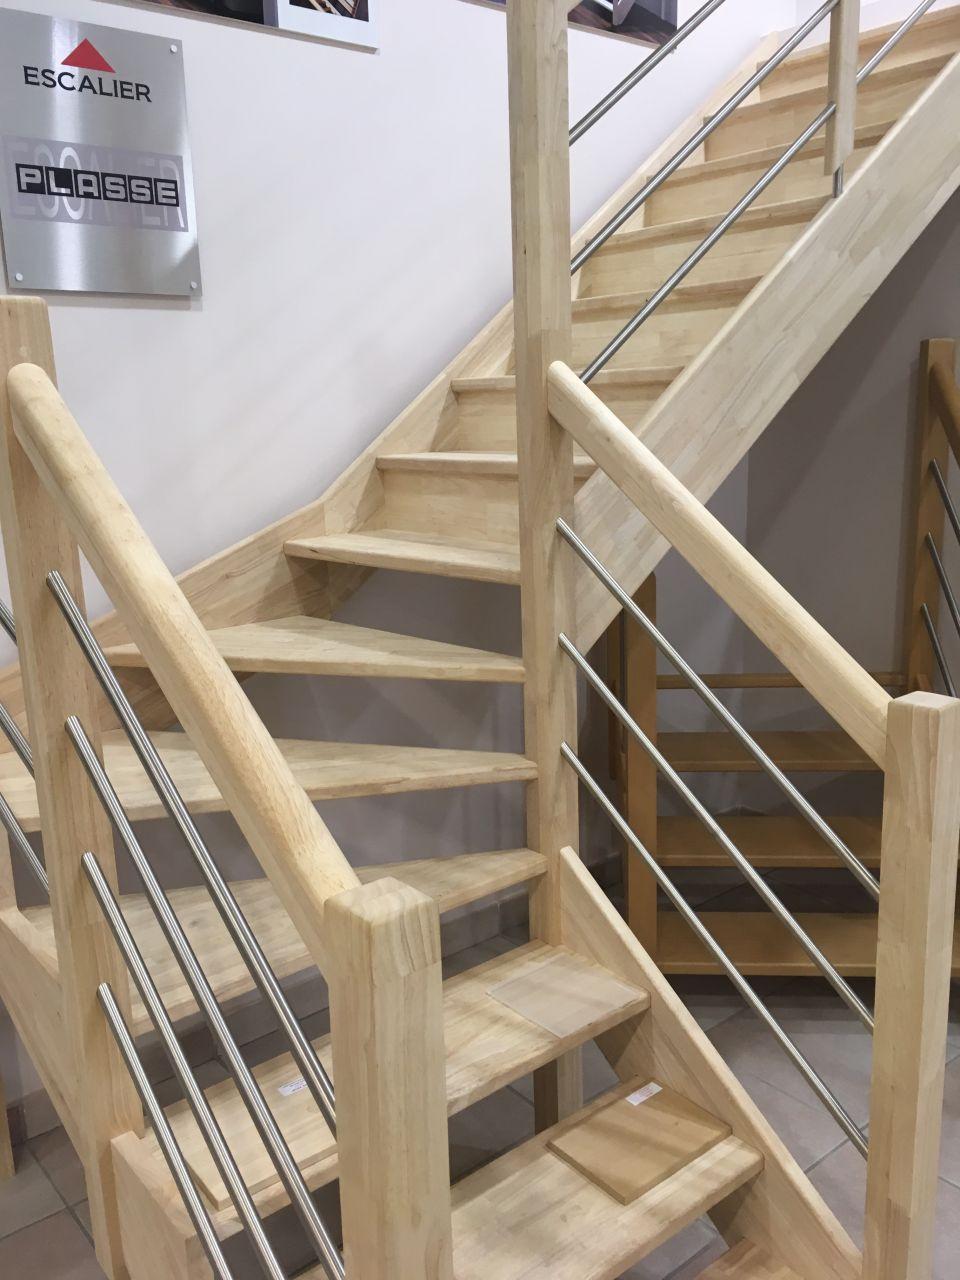 Escalier (version marches pleines)